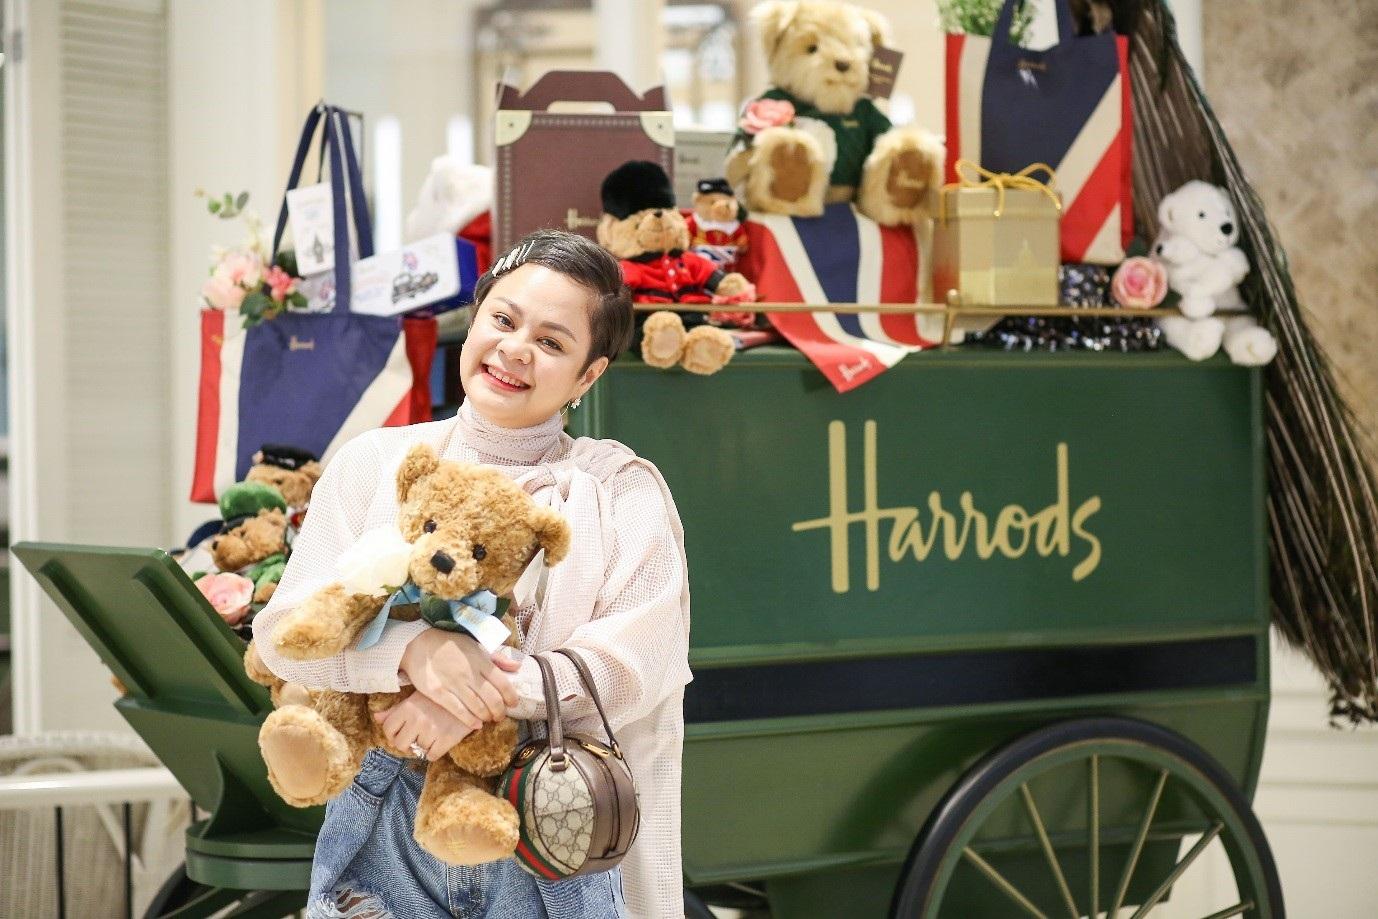 Harrods เปิดประสบการณ์กับ Dinning Destination ใจกลางเมือง